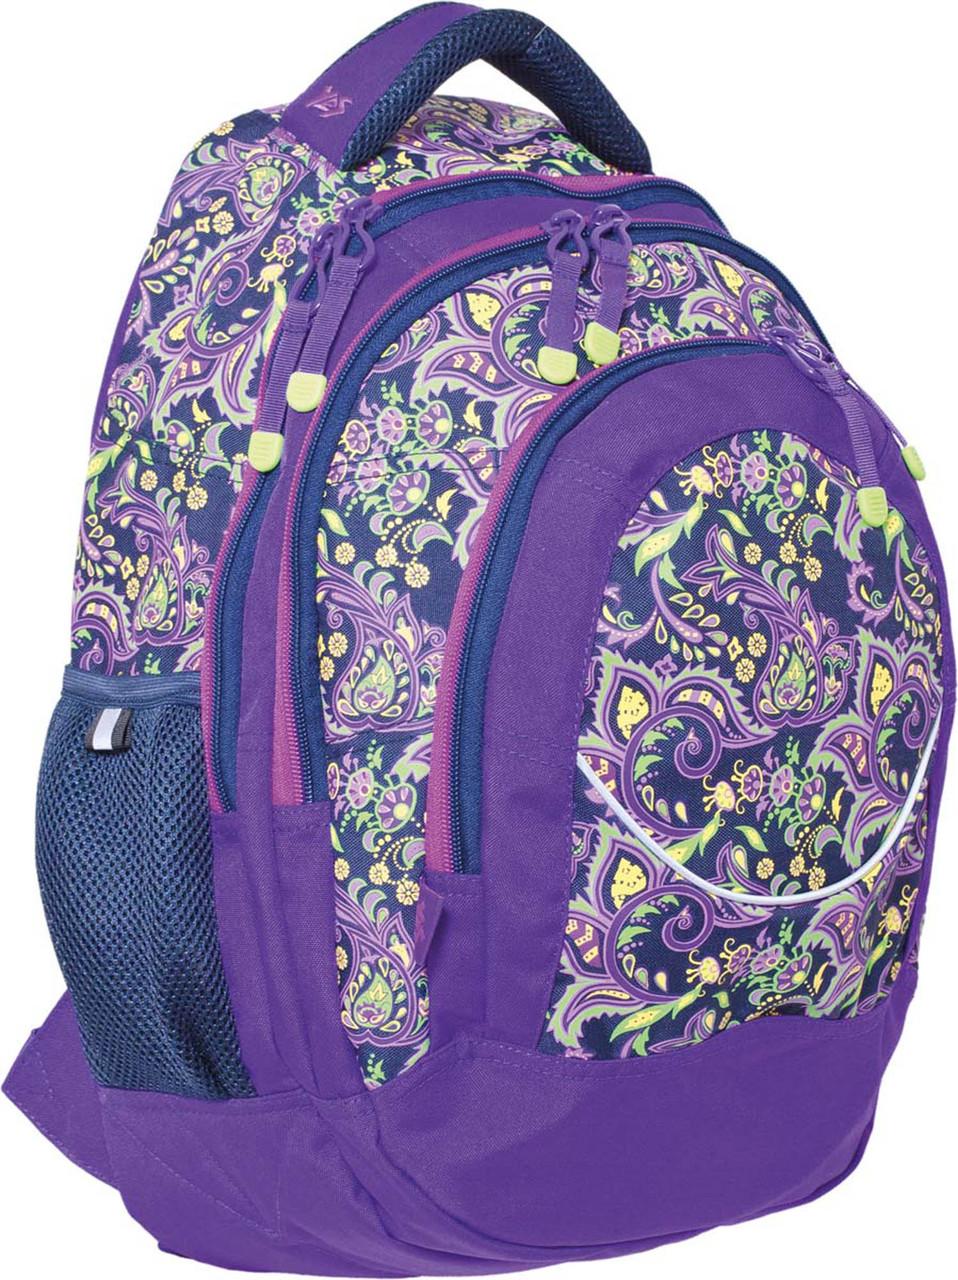 552660 Рюкзак подростковый YES Т-14 Roxy 46,5*33*15